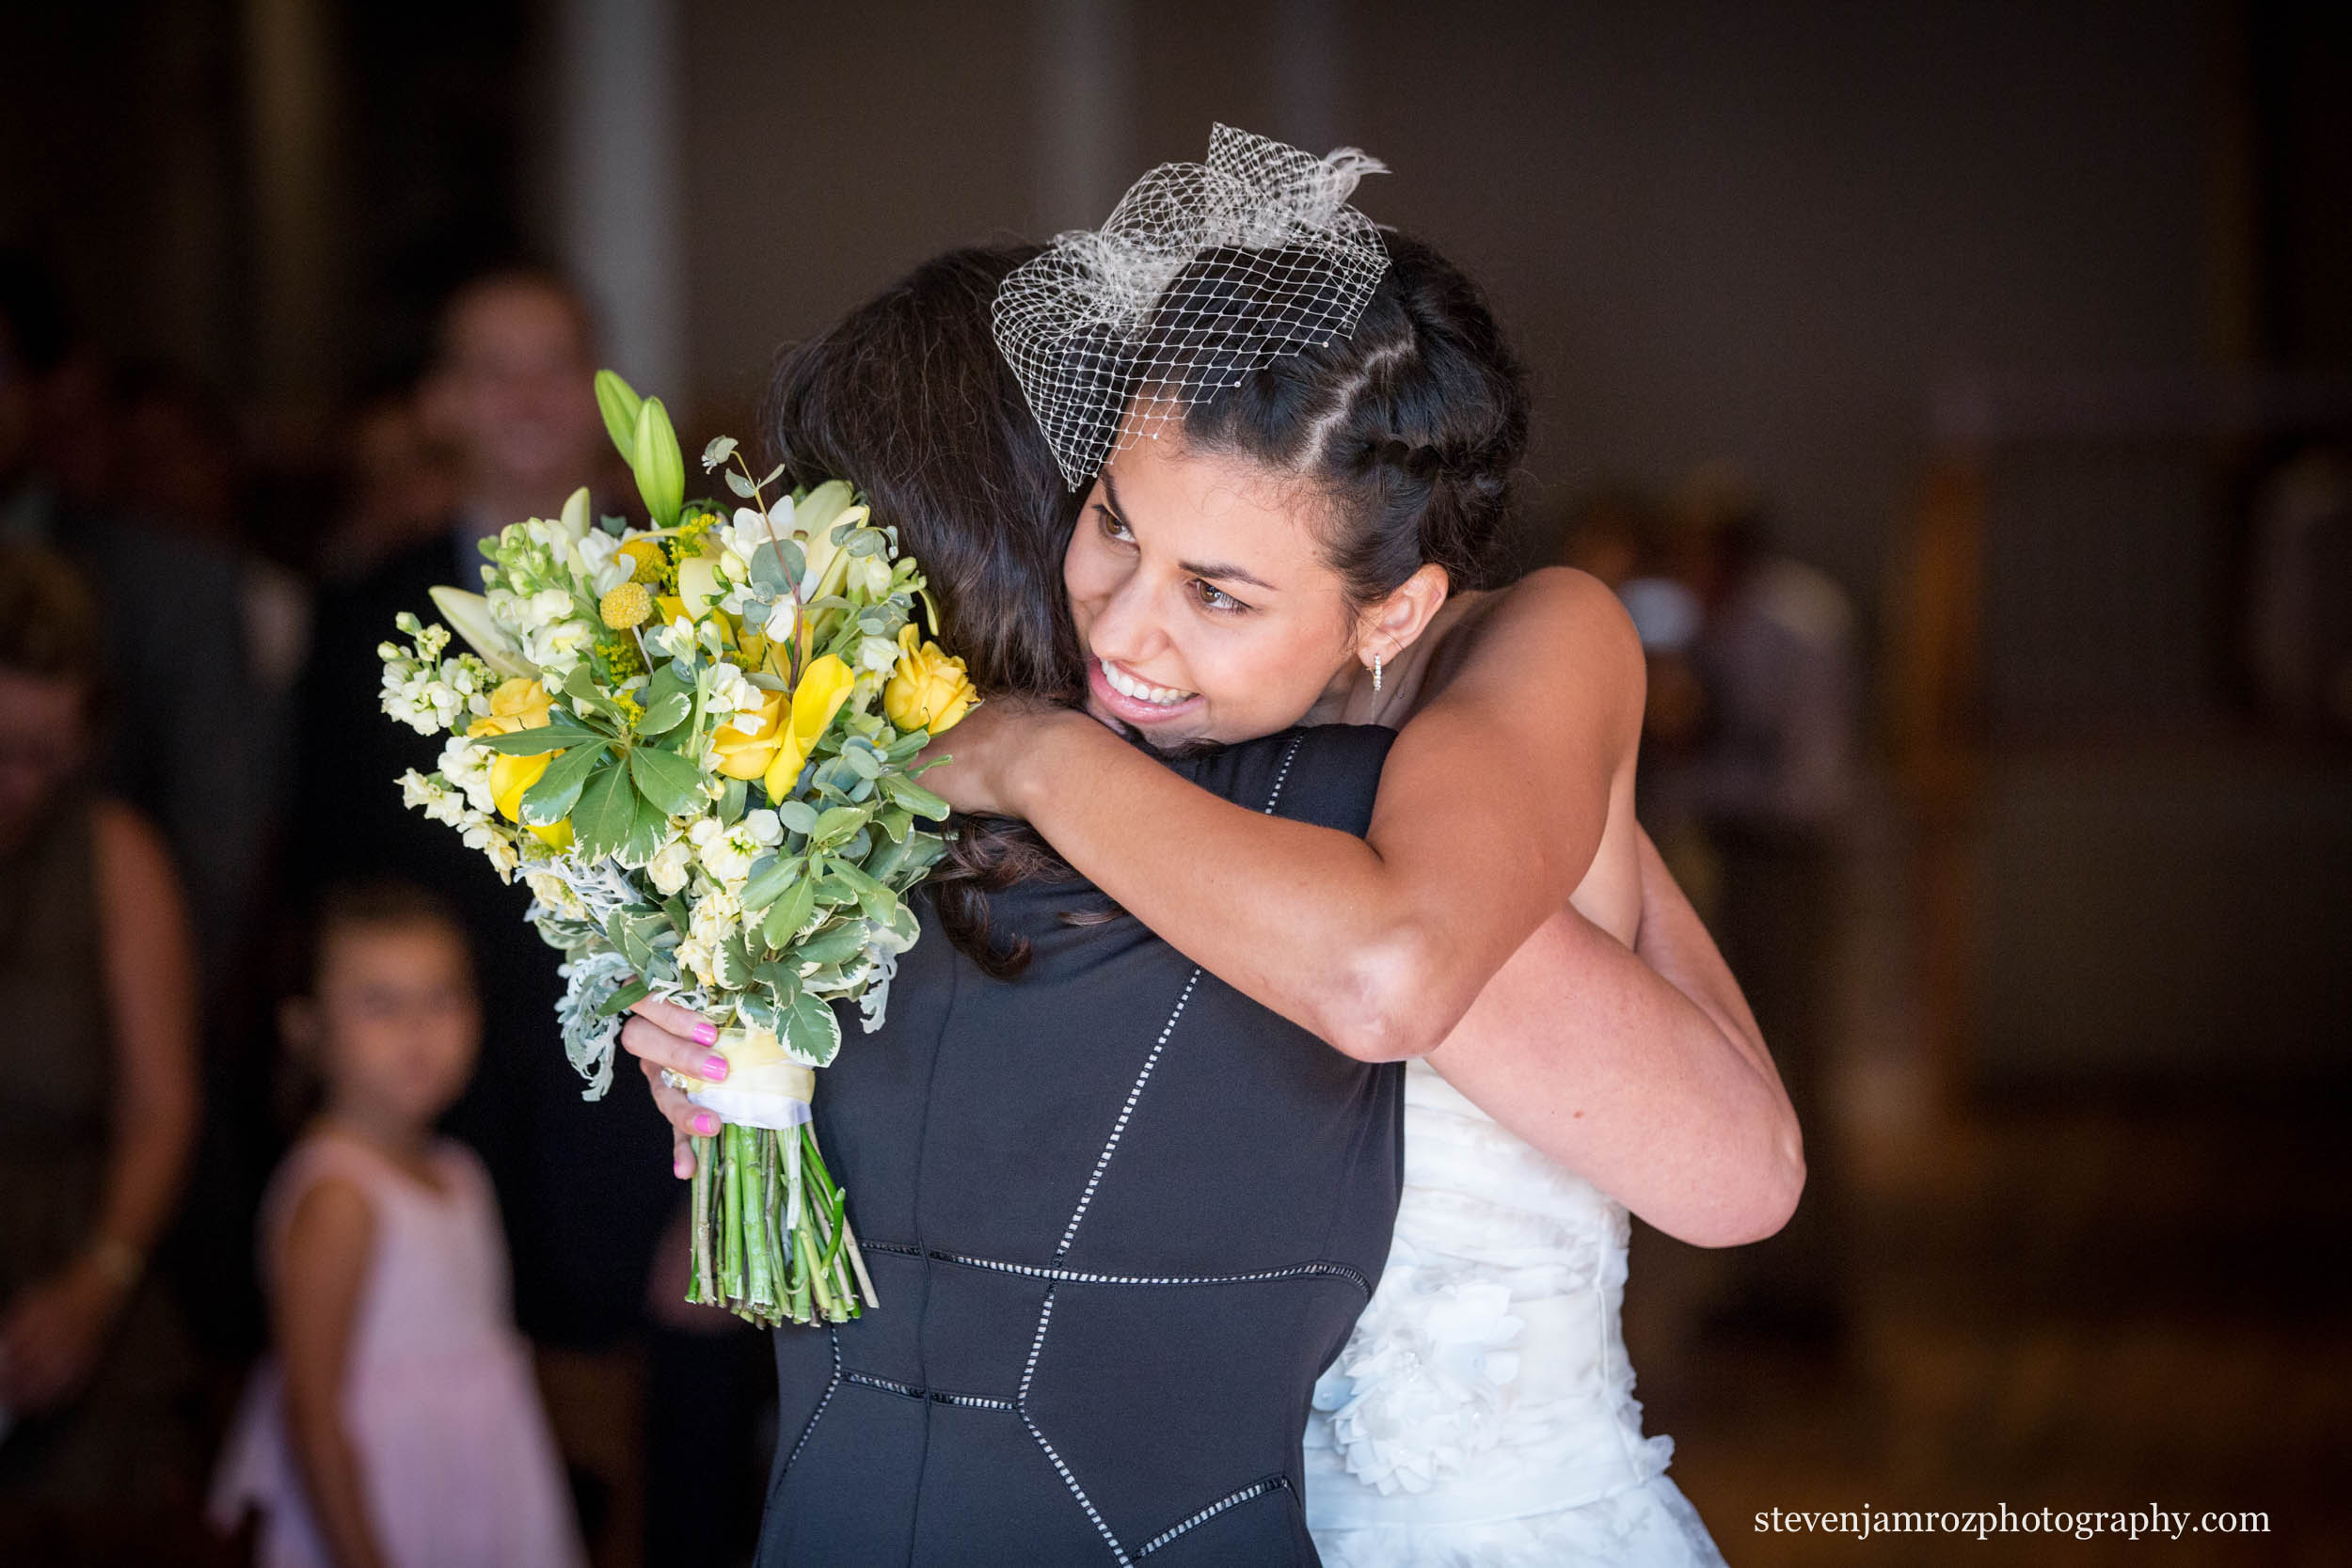 mom-hugs-bride-natural-photojournalism-moment-steven-jamroz-0692.jpg